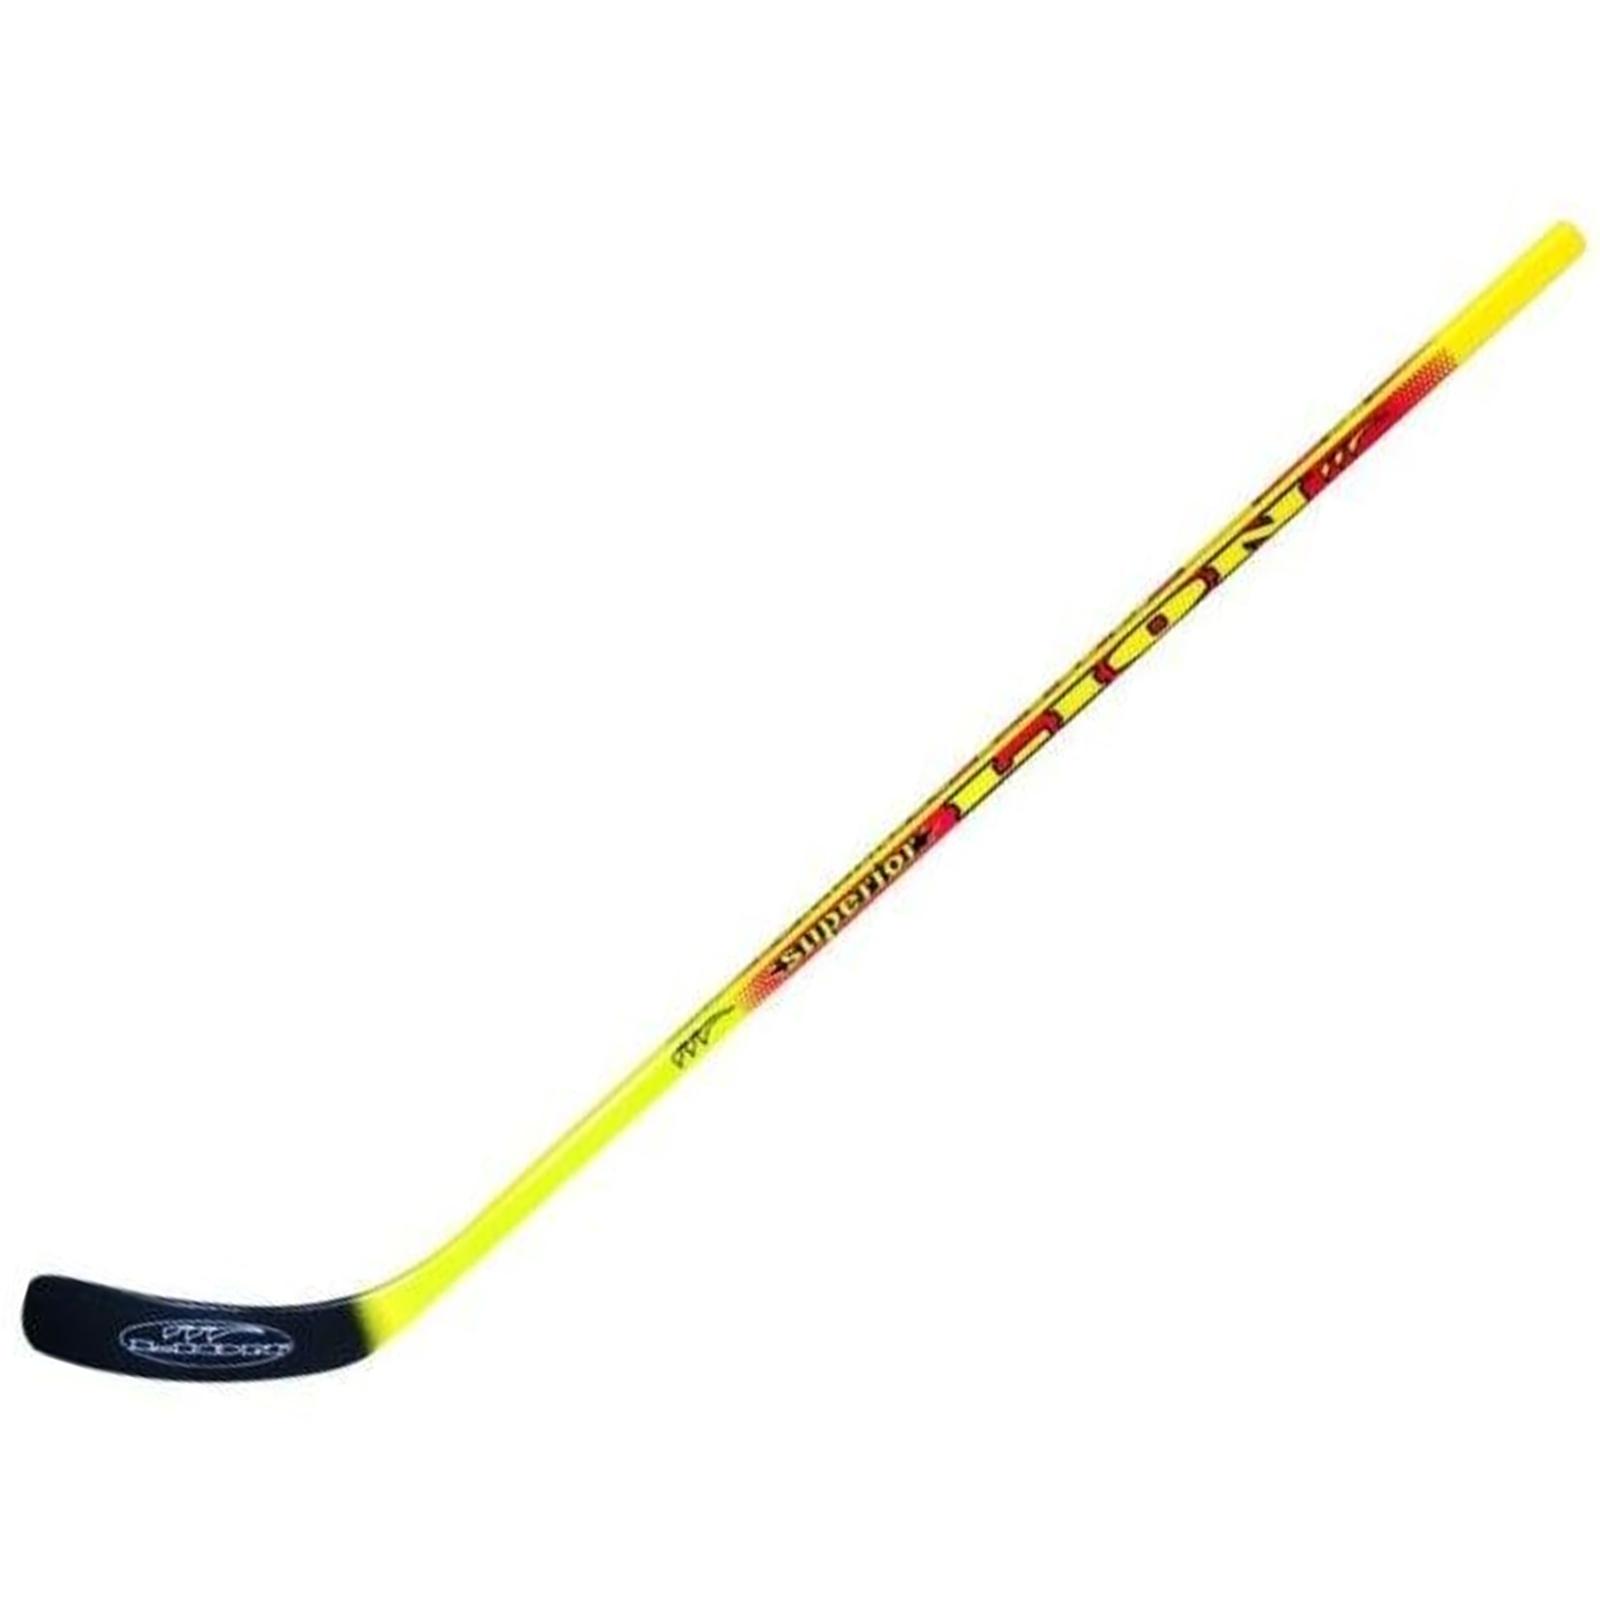 Hokejka LION 6600 - 107 cm levá - červeno-žlutá